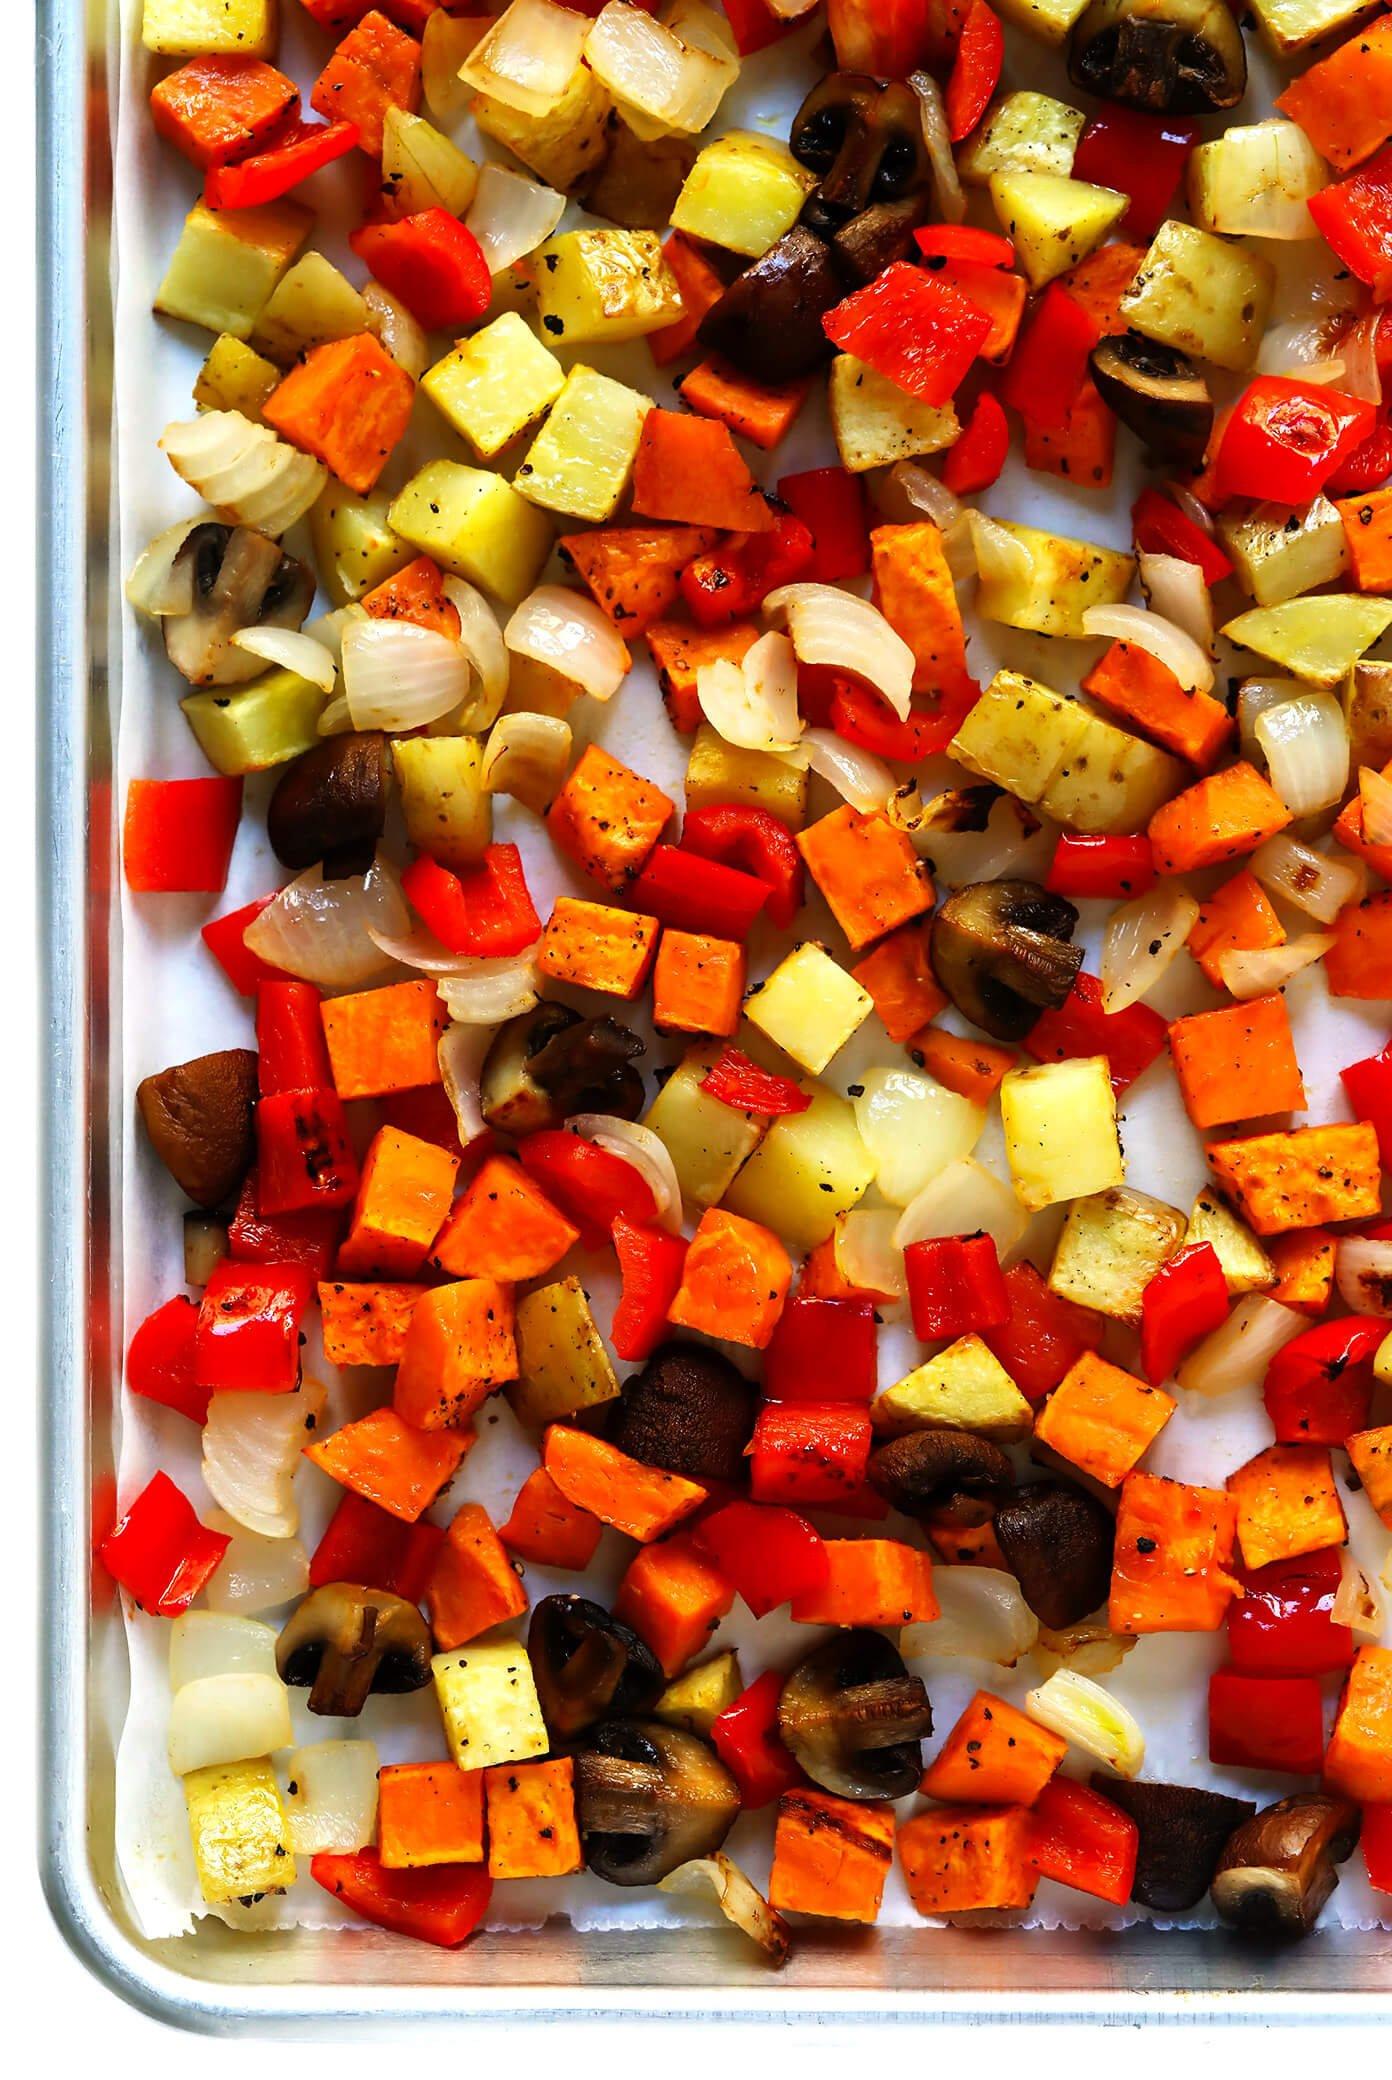 Roasted Vegetables | Cozy Autumn Breakfast Casserole Recipe